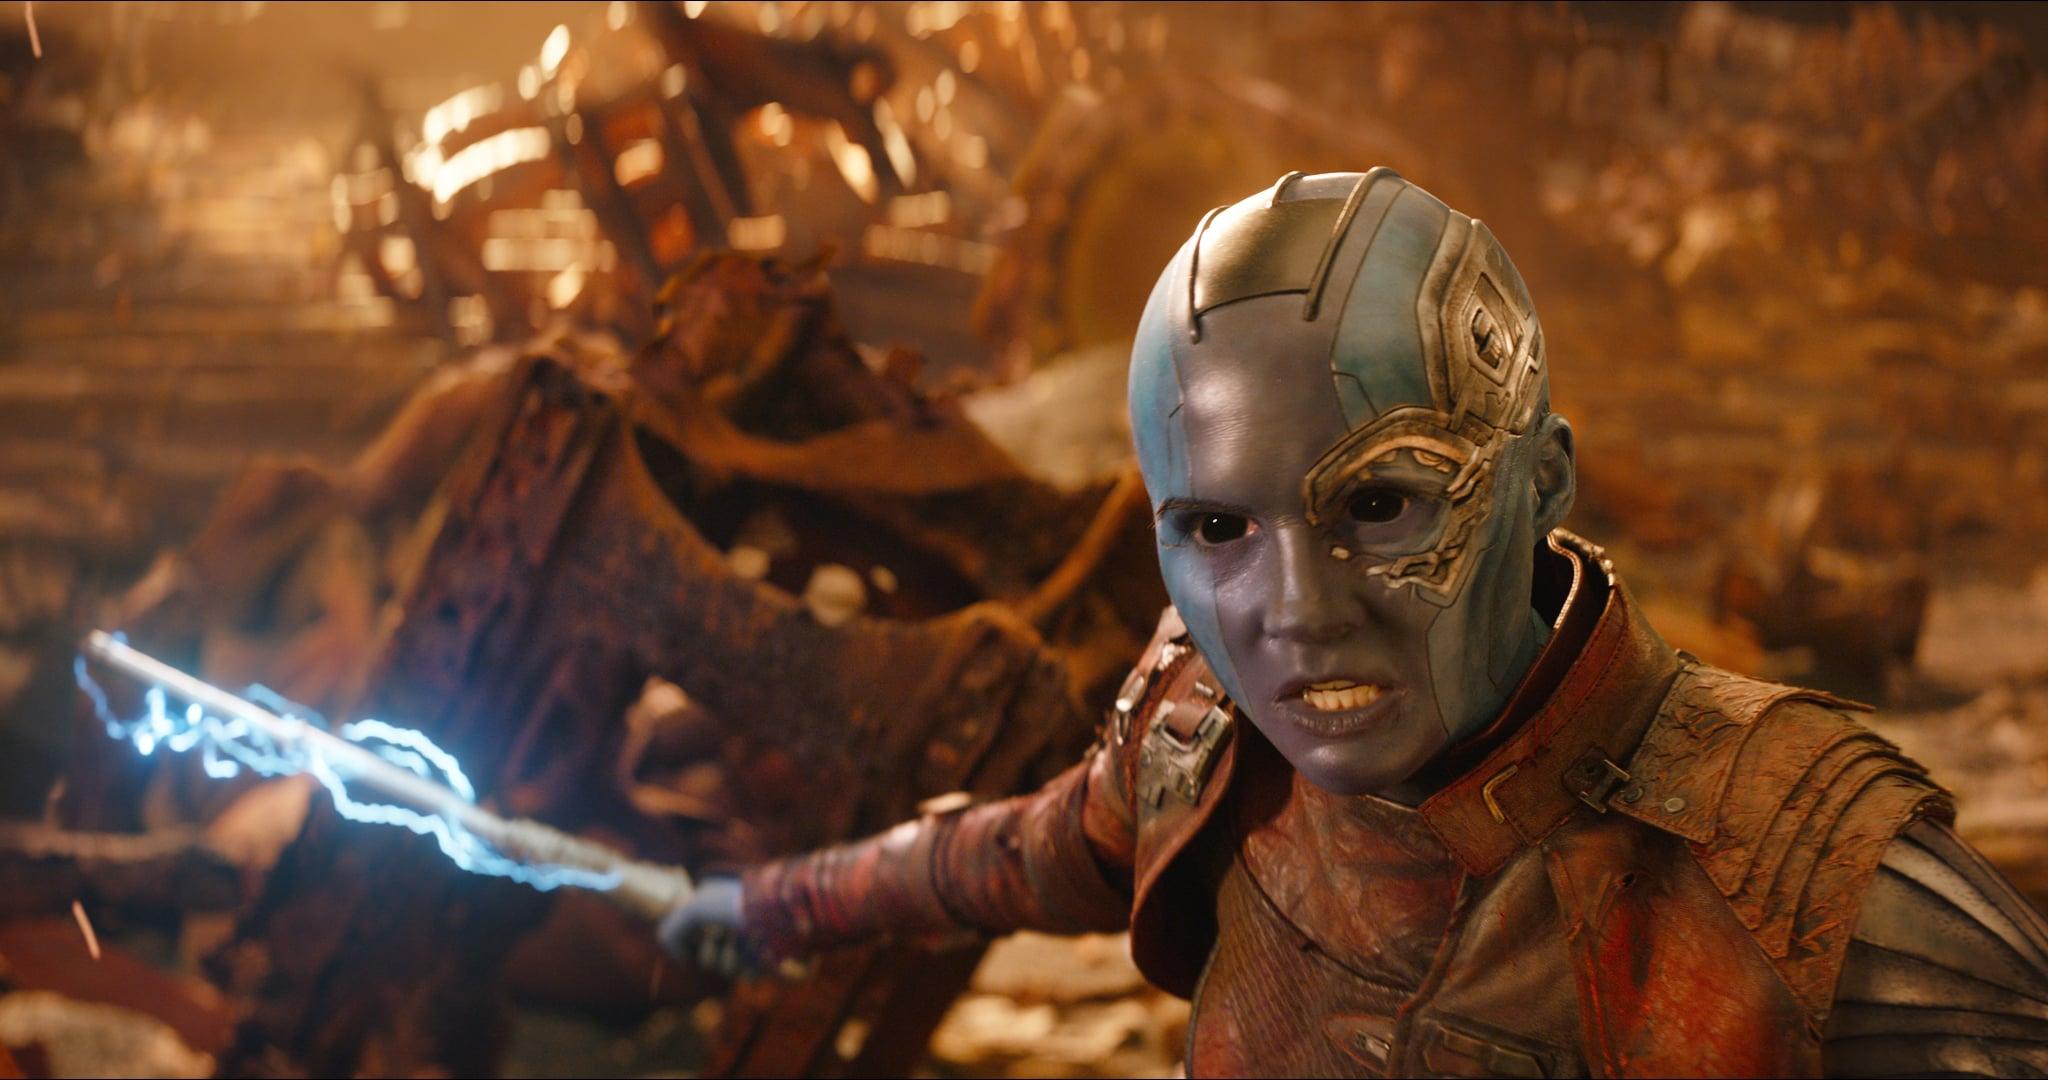 Небула Карен Гиллан - Стражи Галактики (2014), Стражи Галактики 2 (2017), Мстители: Война бесконечности (2018), Мстители: Финал (2019)